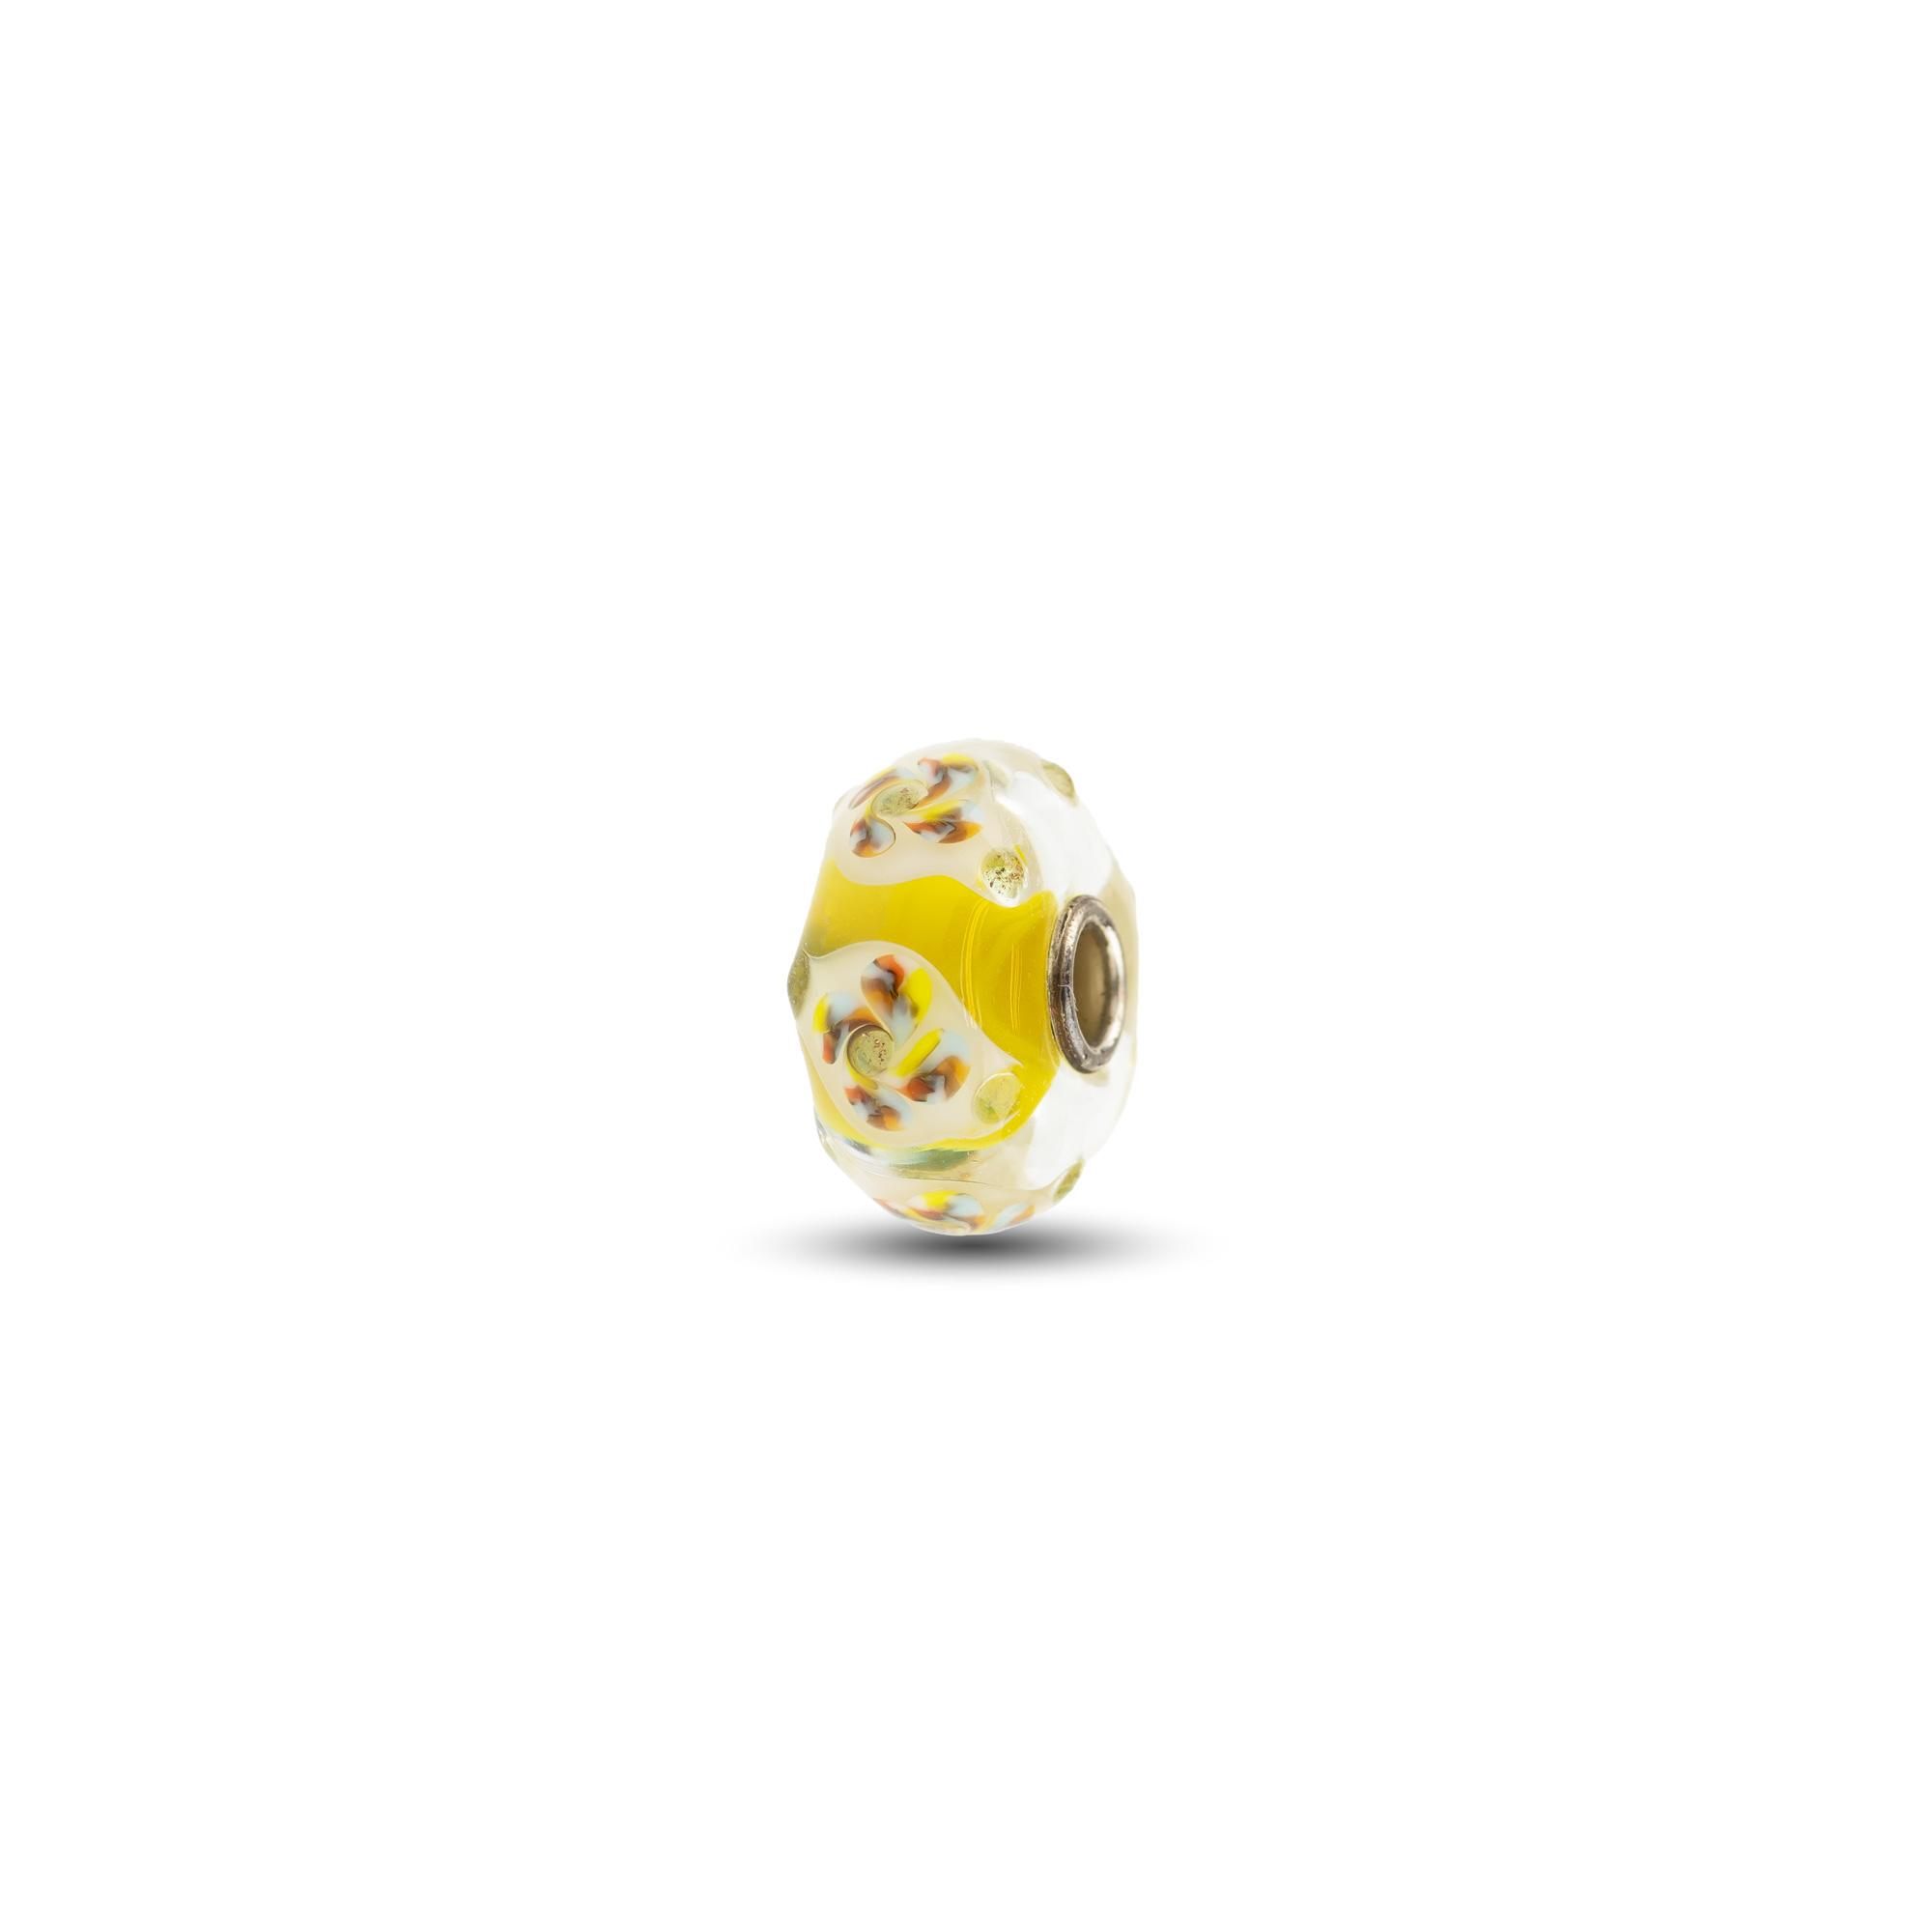 Beads Trollbeads Unico